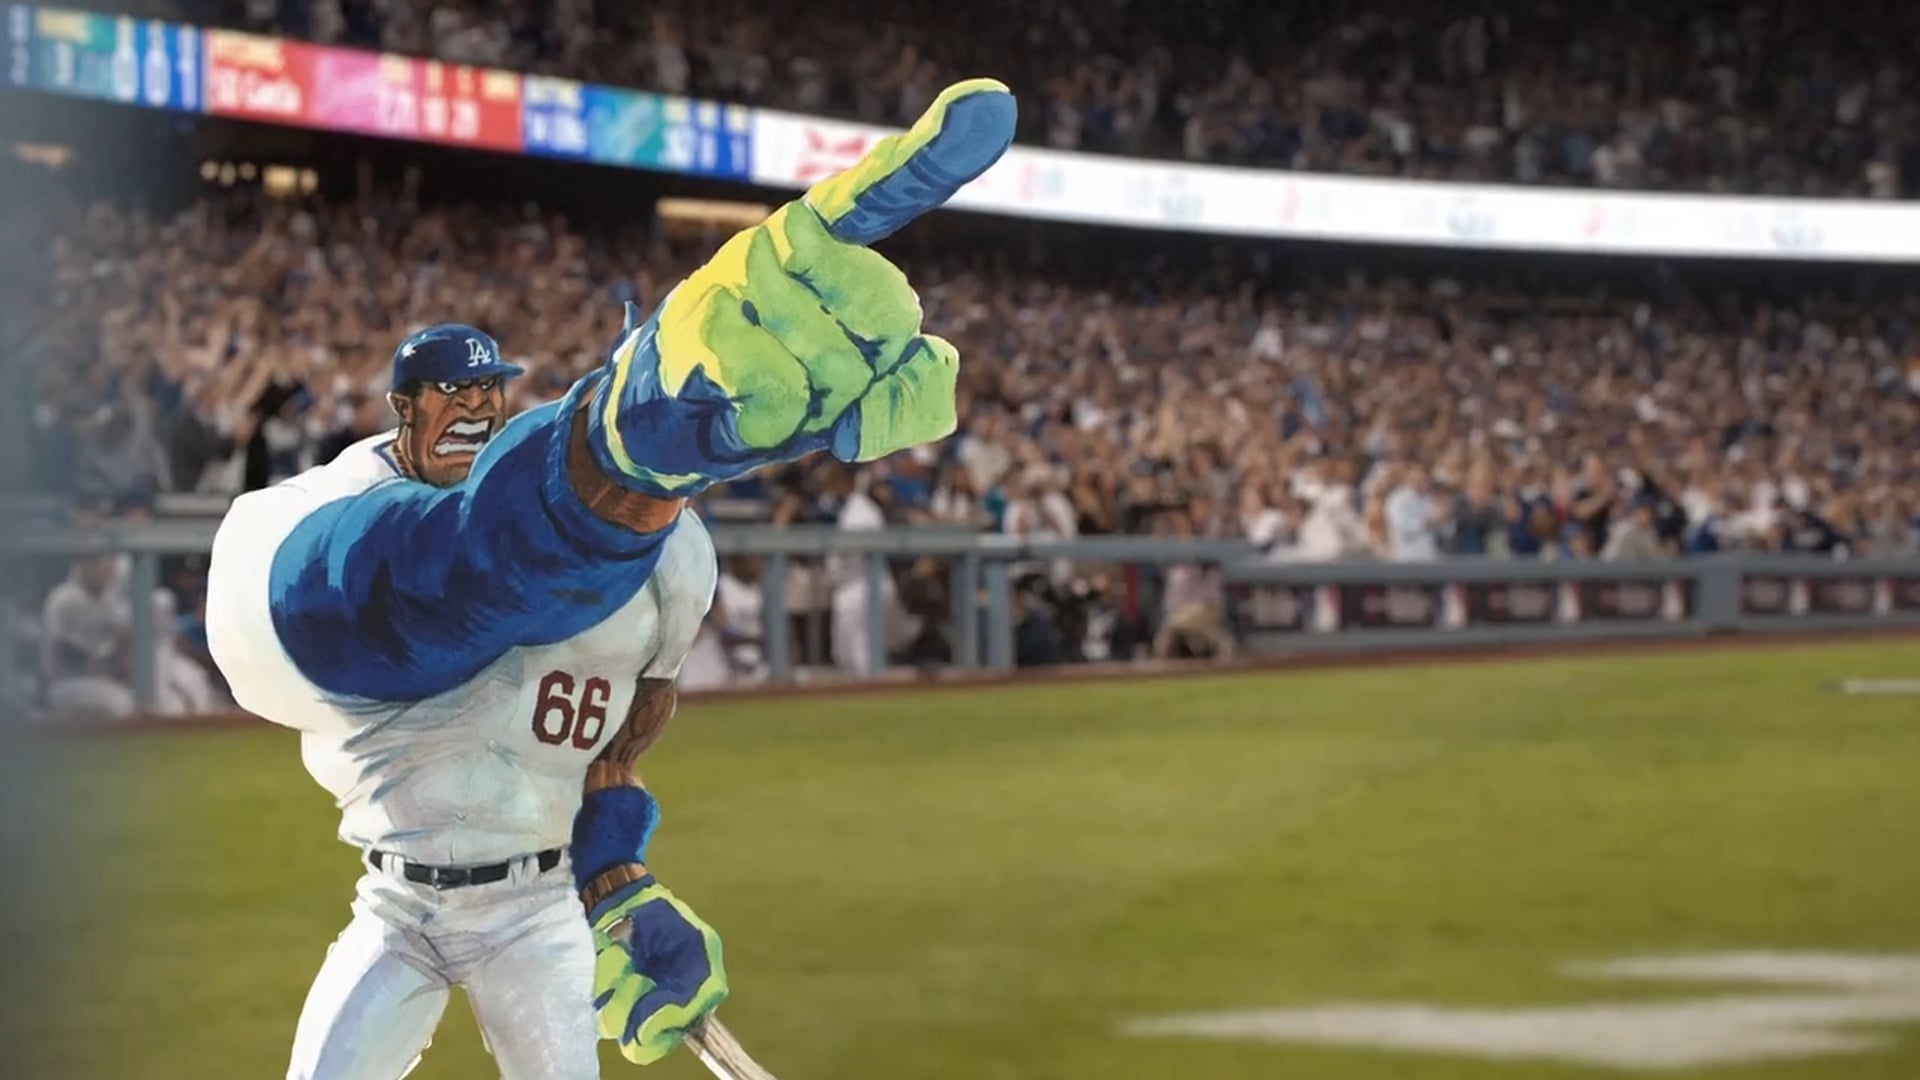 Los Angeles Dodgers In-Stadium Game Open